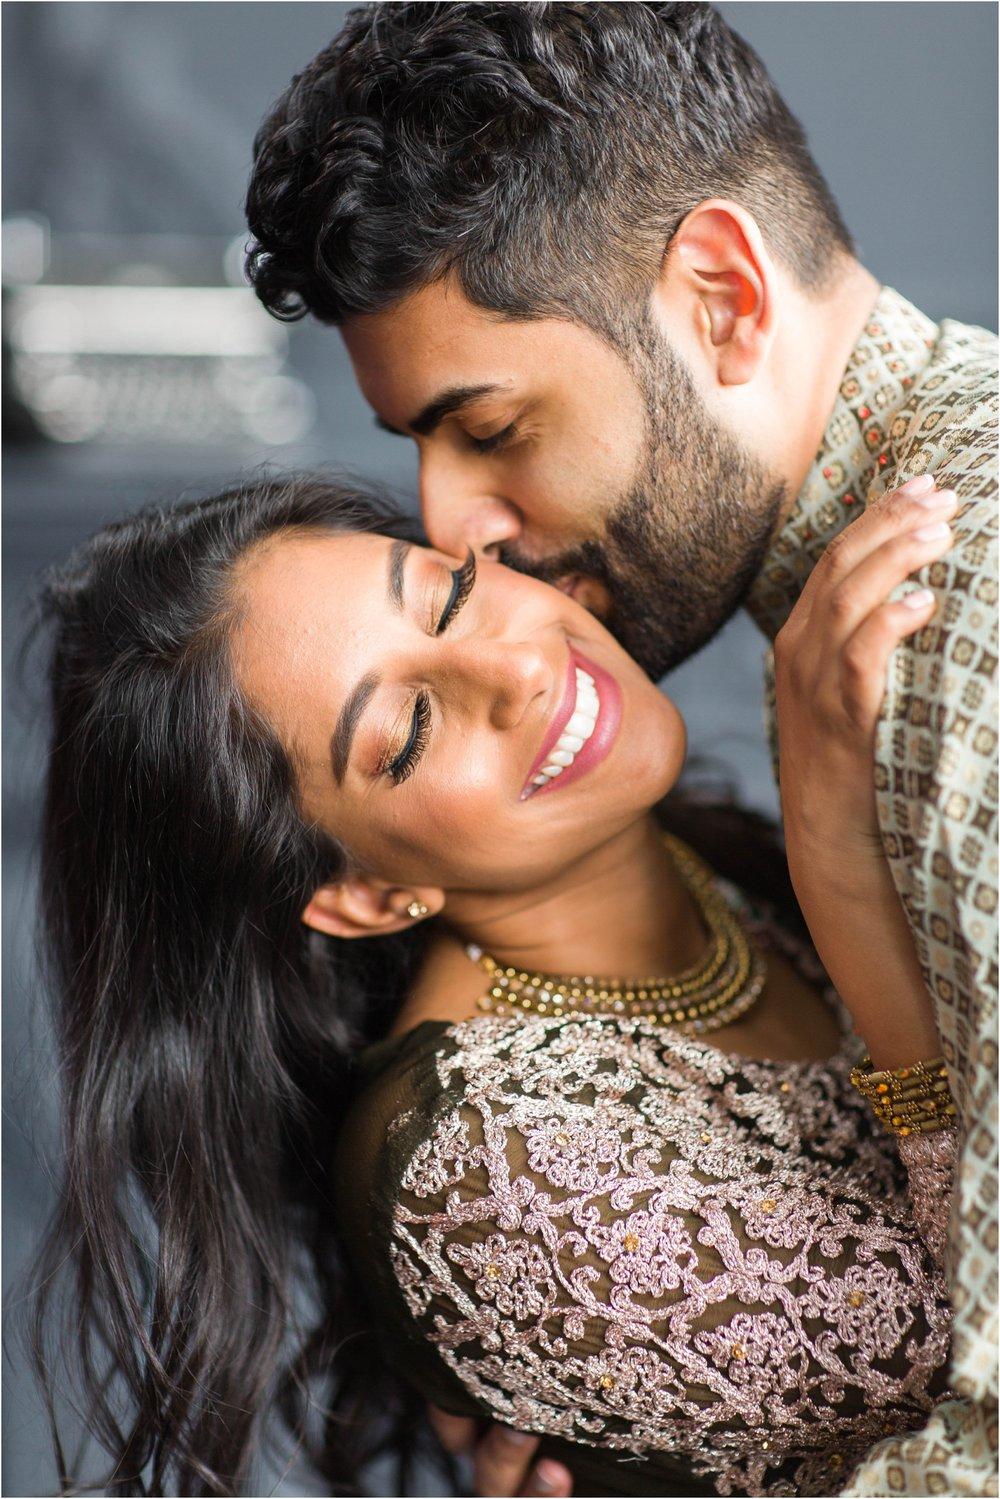 Mint-Room-Studios-Anniversary-Session-Toronto-Mississauga-Brampton-Scarborough-GTA-Pakistani-Indian-Wedding-Engagement-Photographer-Photography_0038.jpg